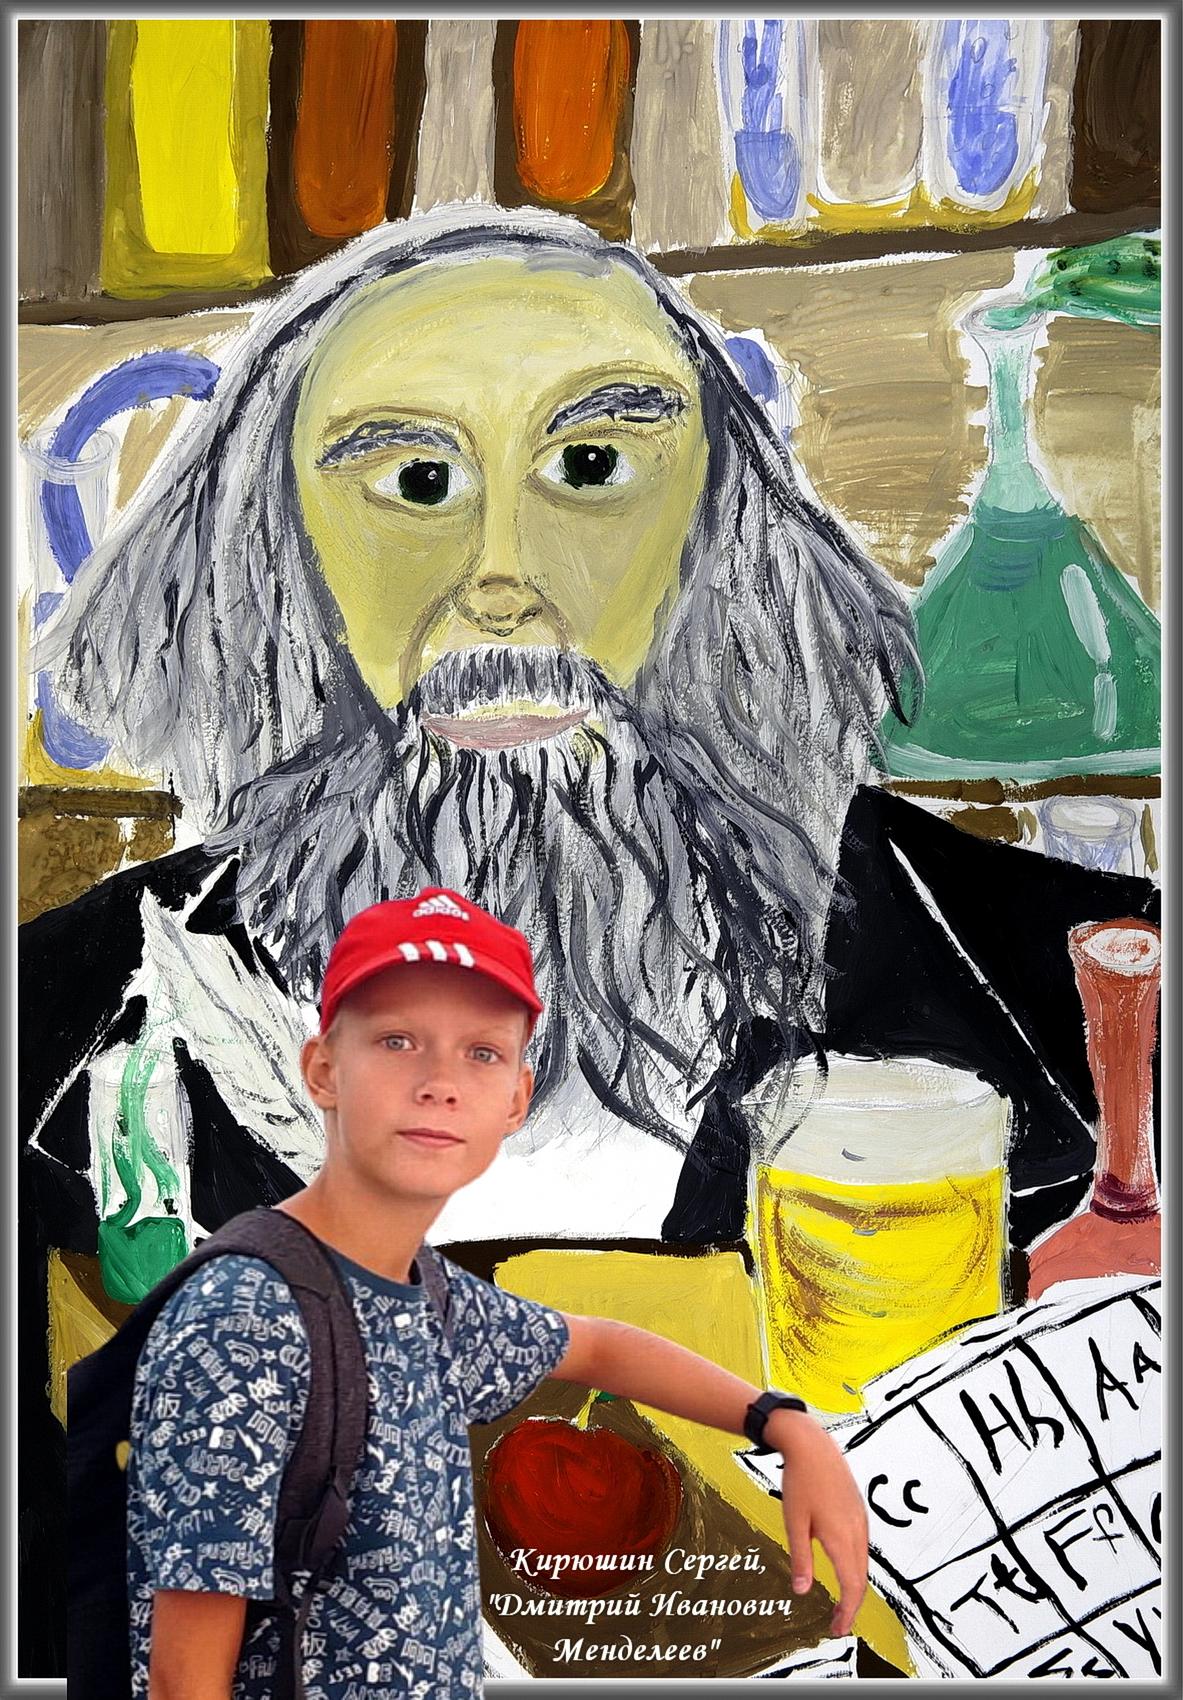 Kiryuschin-Sergei.jpg